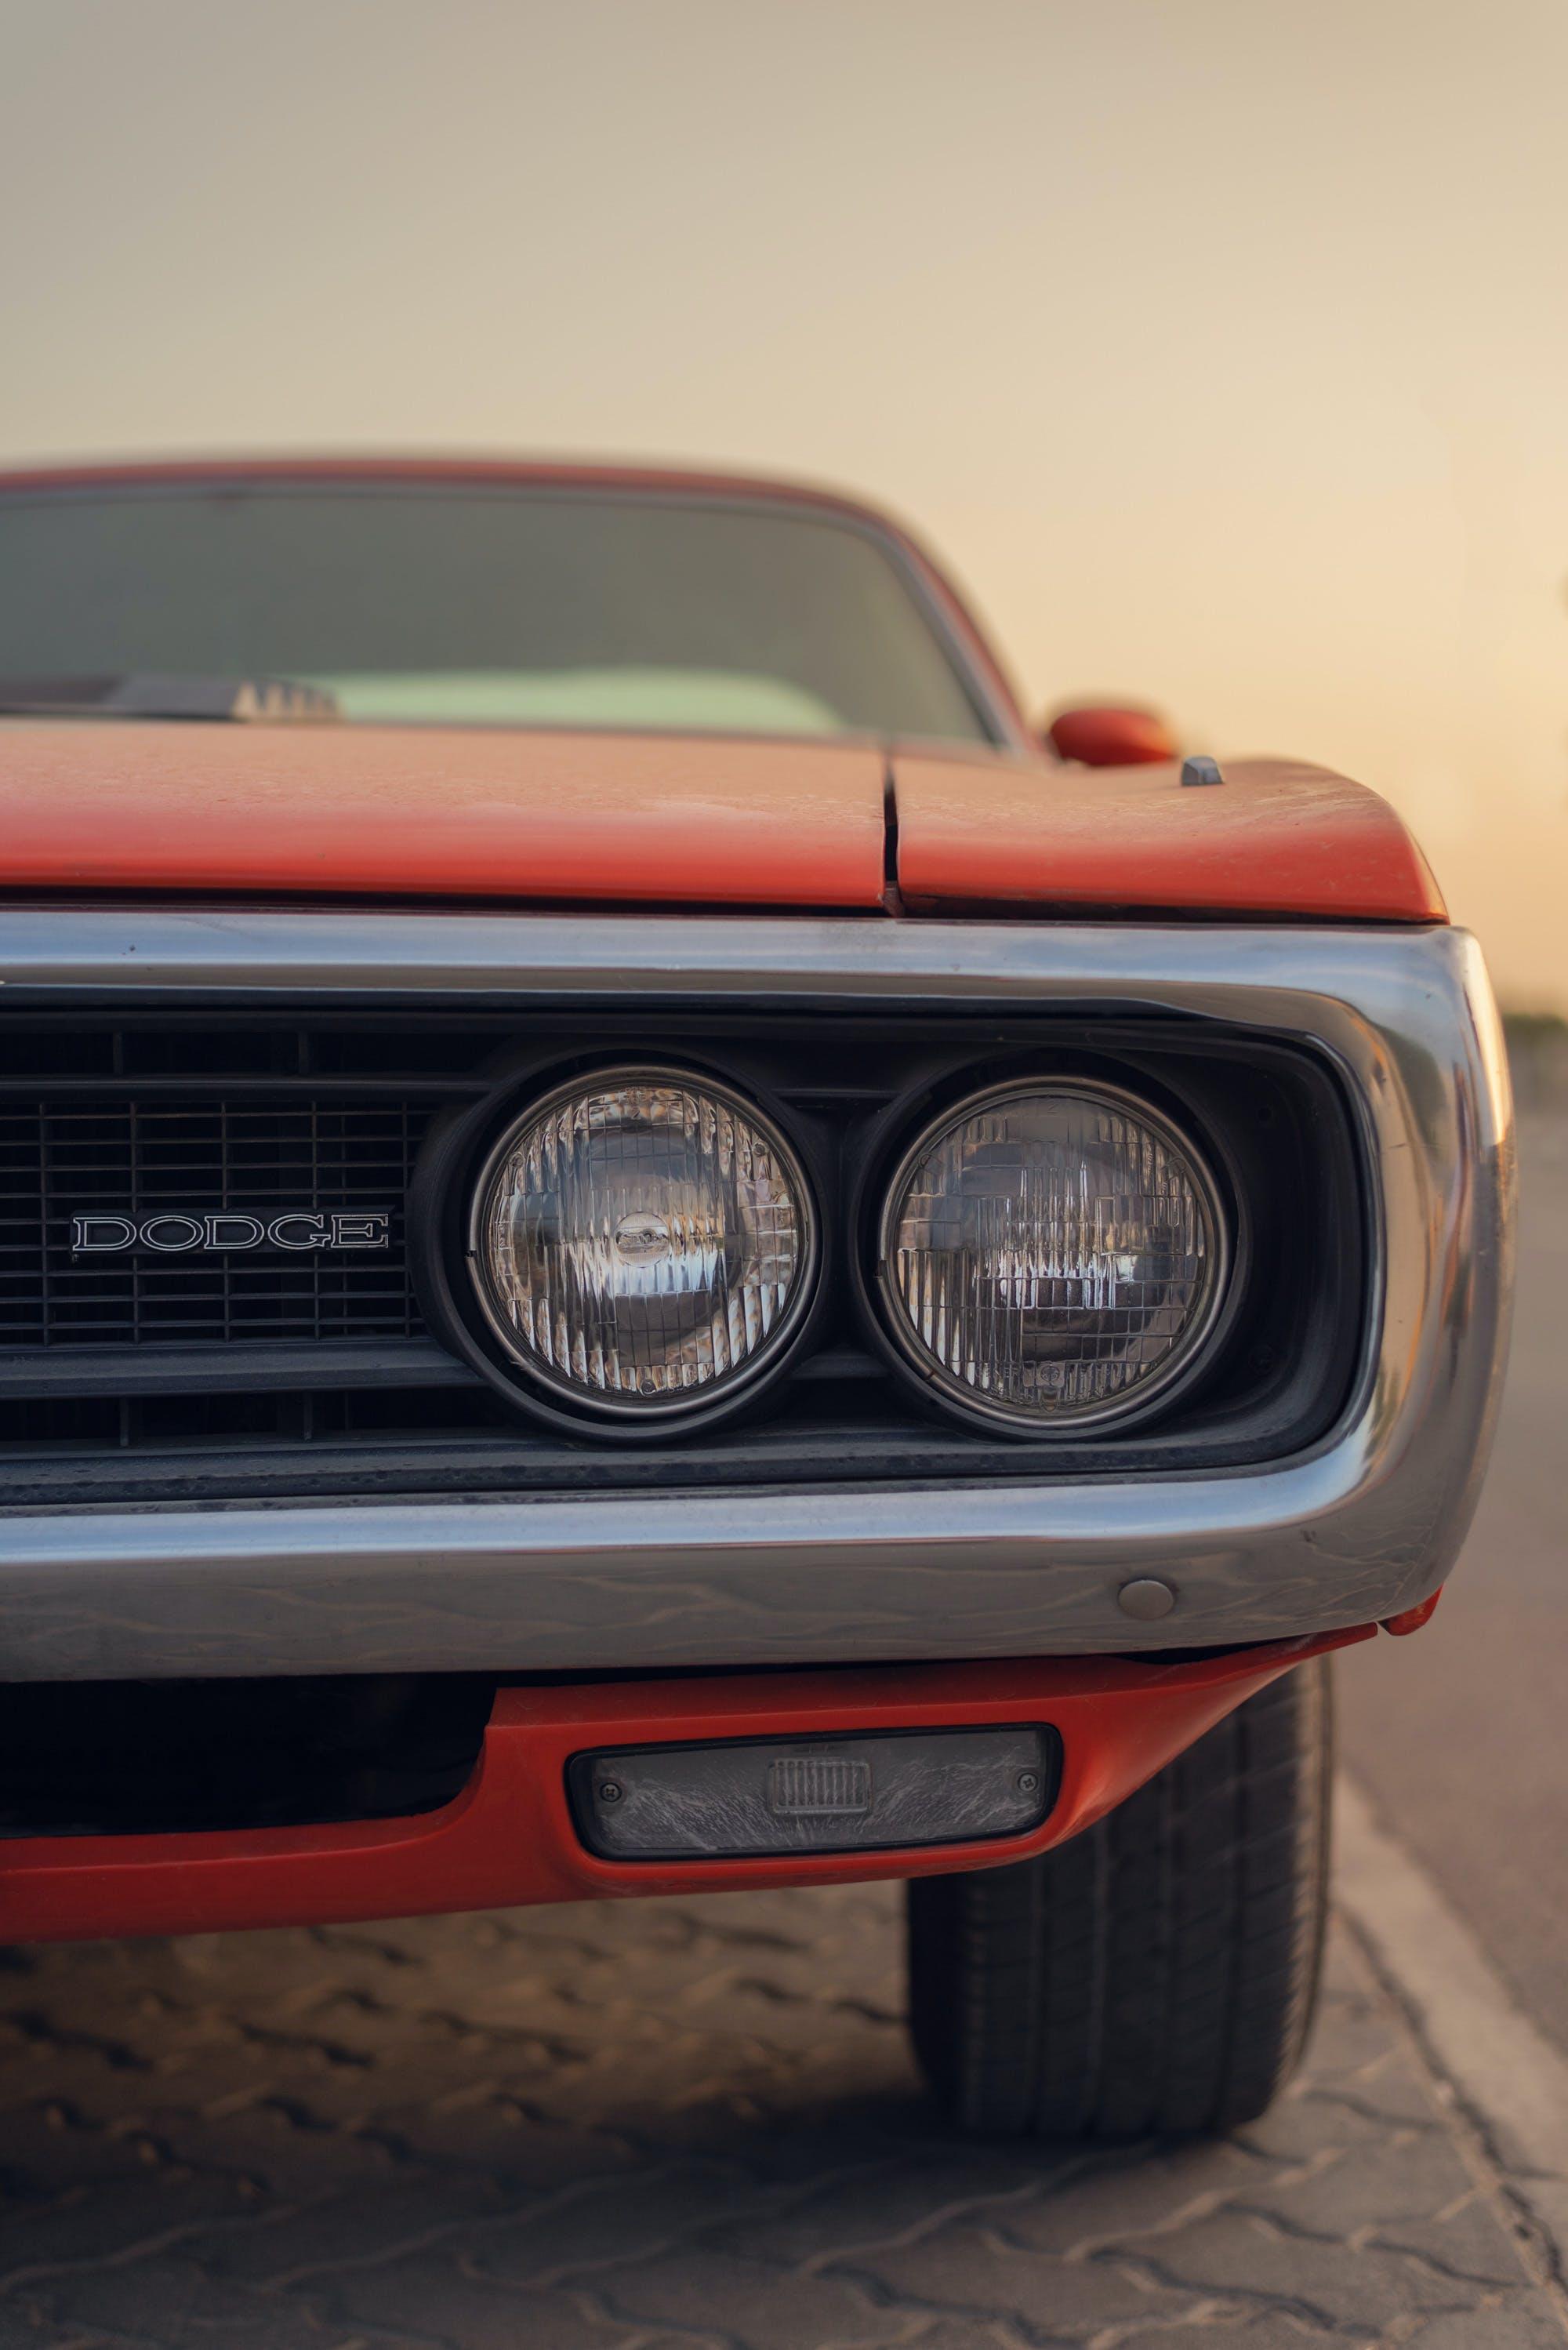 Free stock photo of american car, car model, dodge, golden sunset